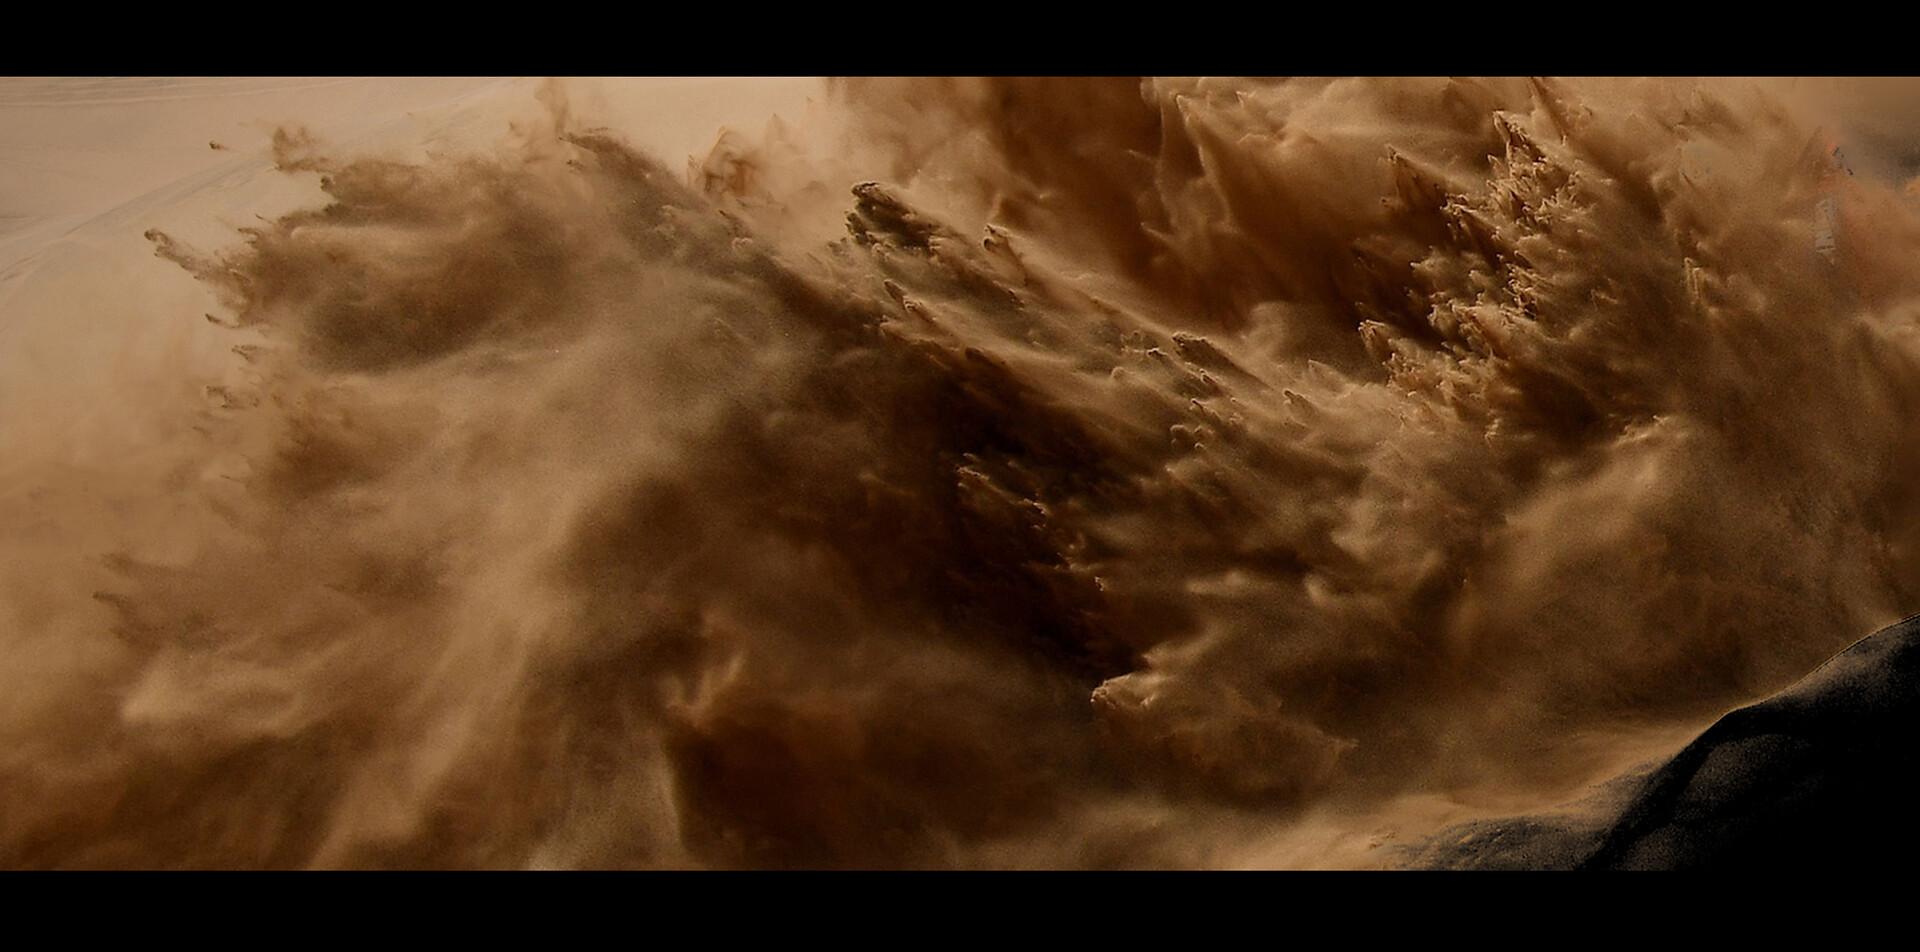 Andrei riabovitchev th sandstorm v003 001 ar